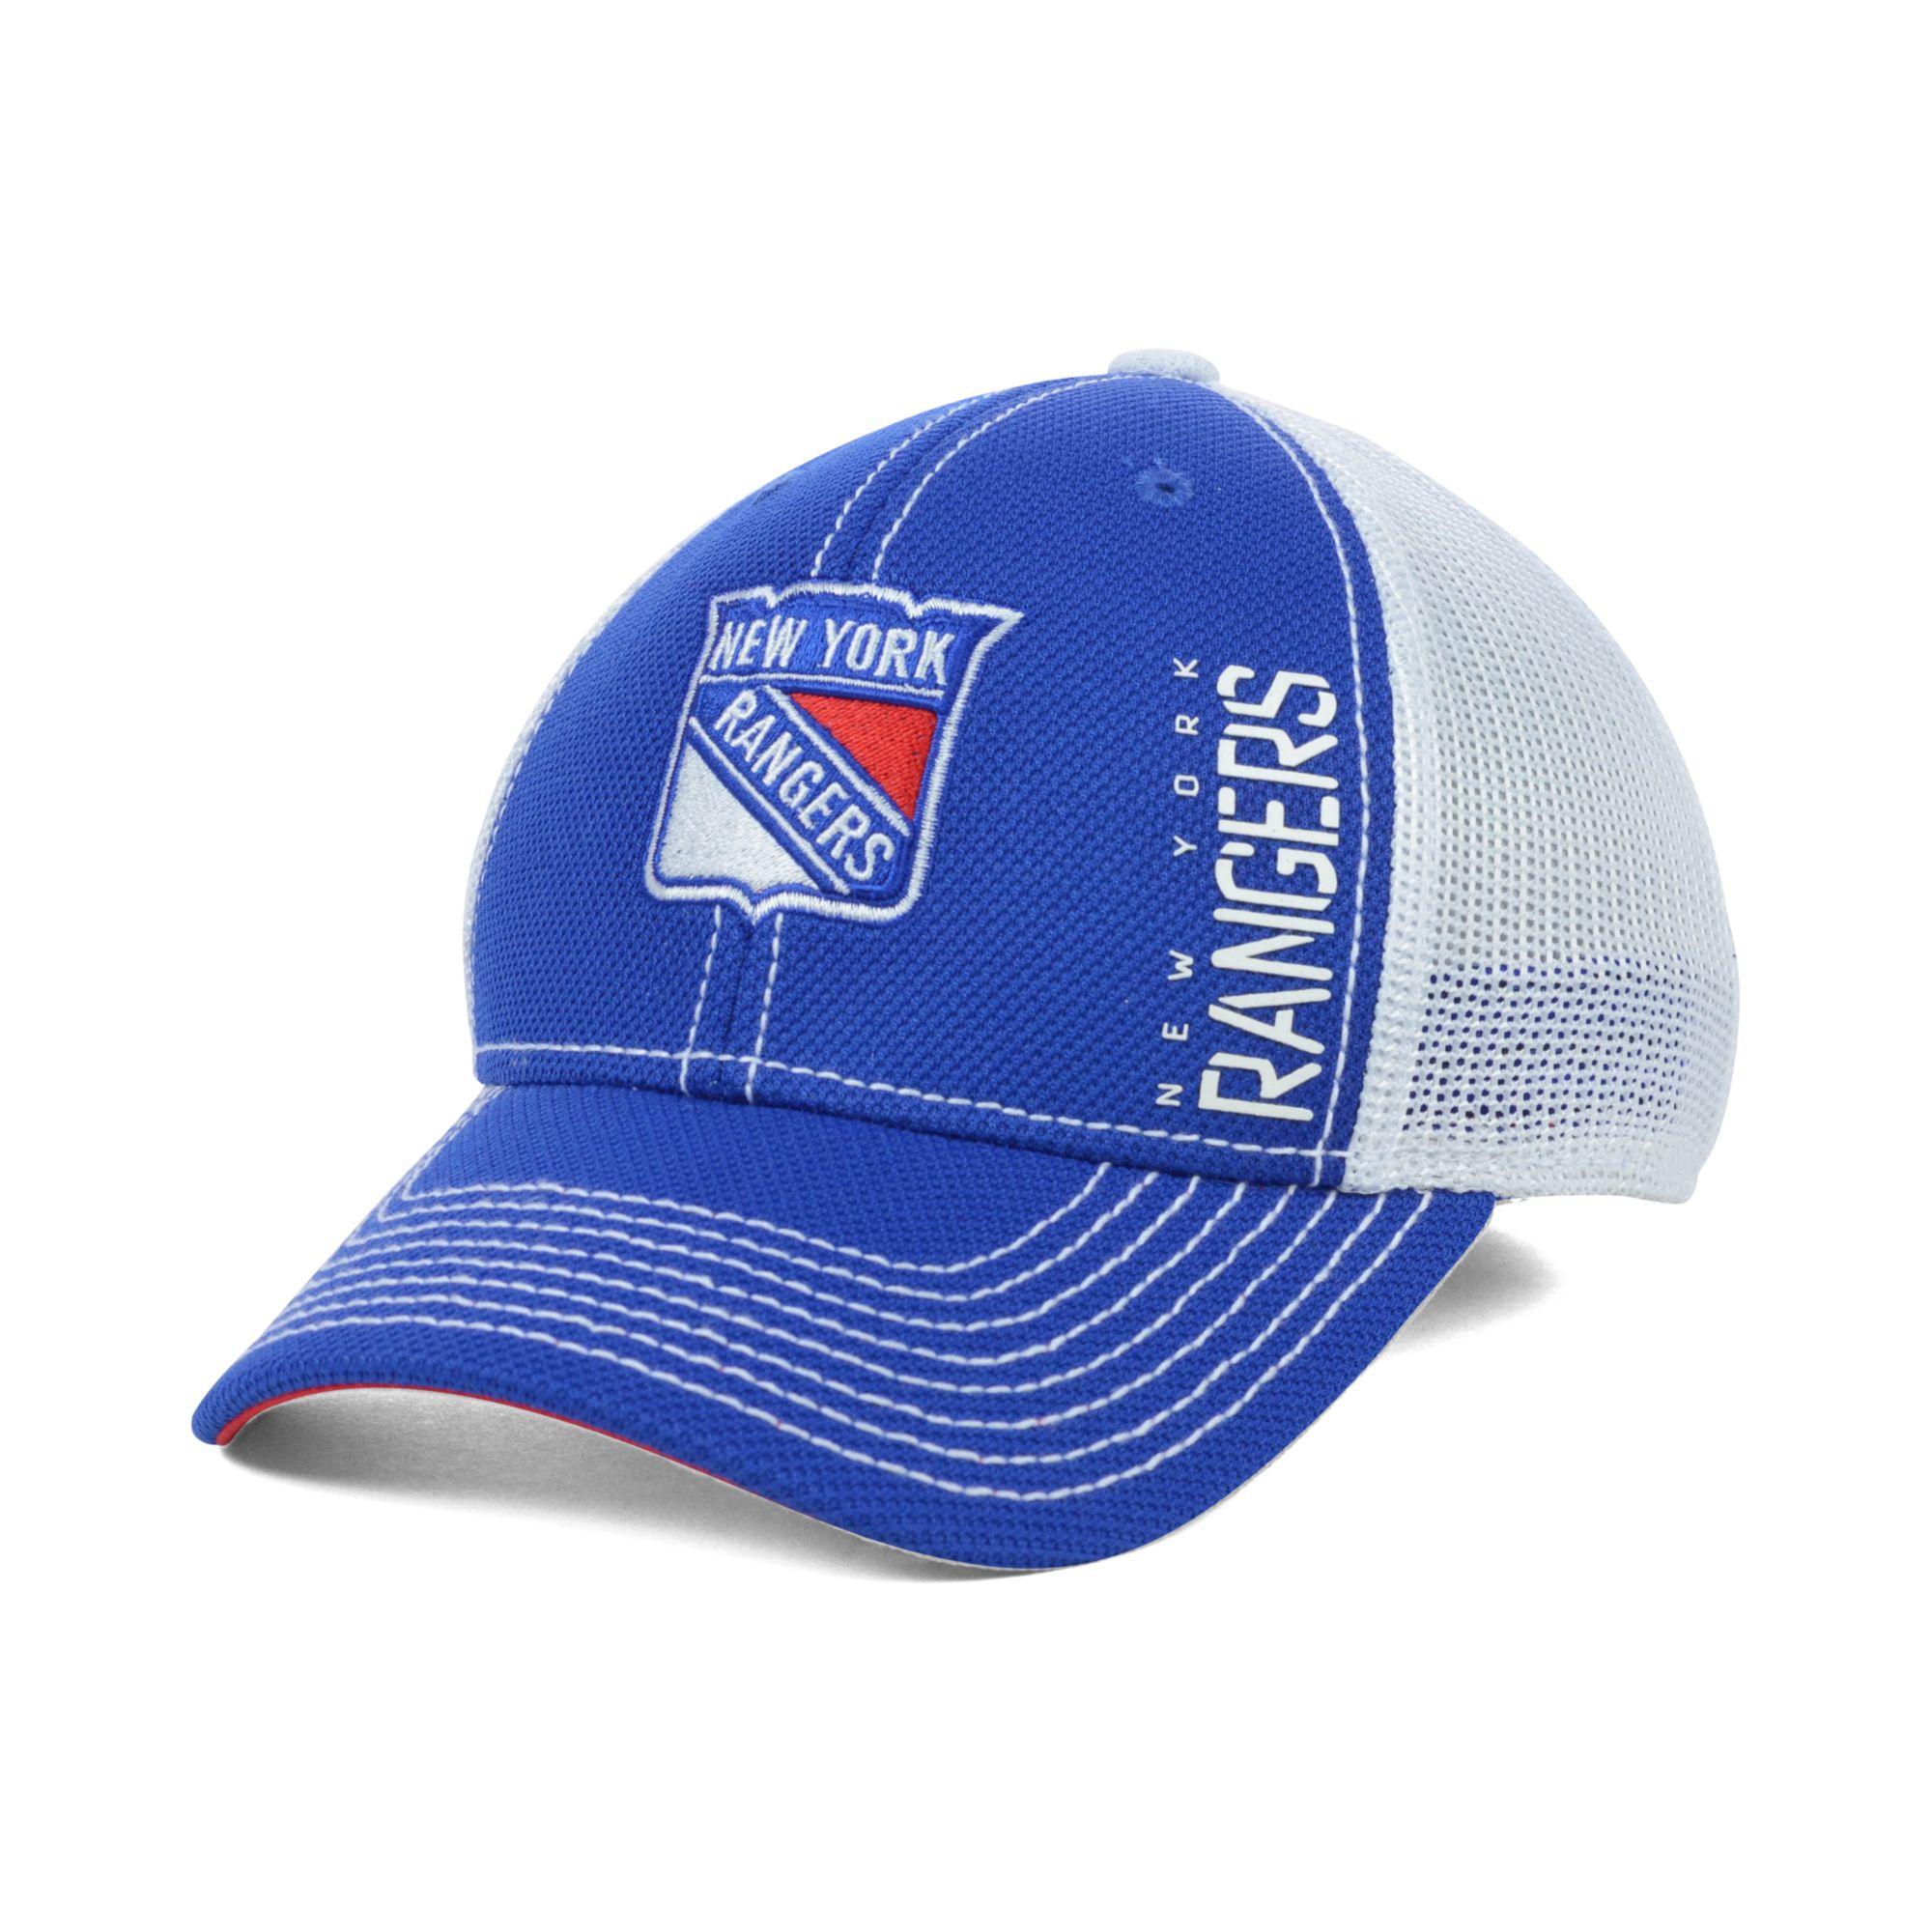 ecb5a883f6f Lyst - Reebok New York Rangers Face Off Mesh Cap in Blue